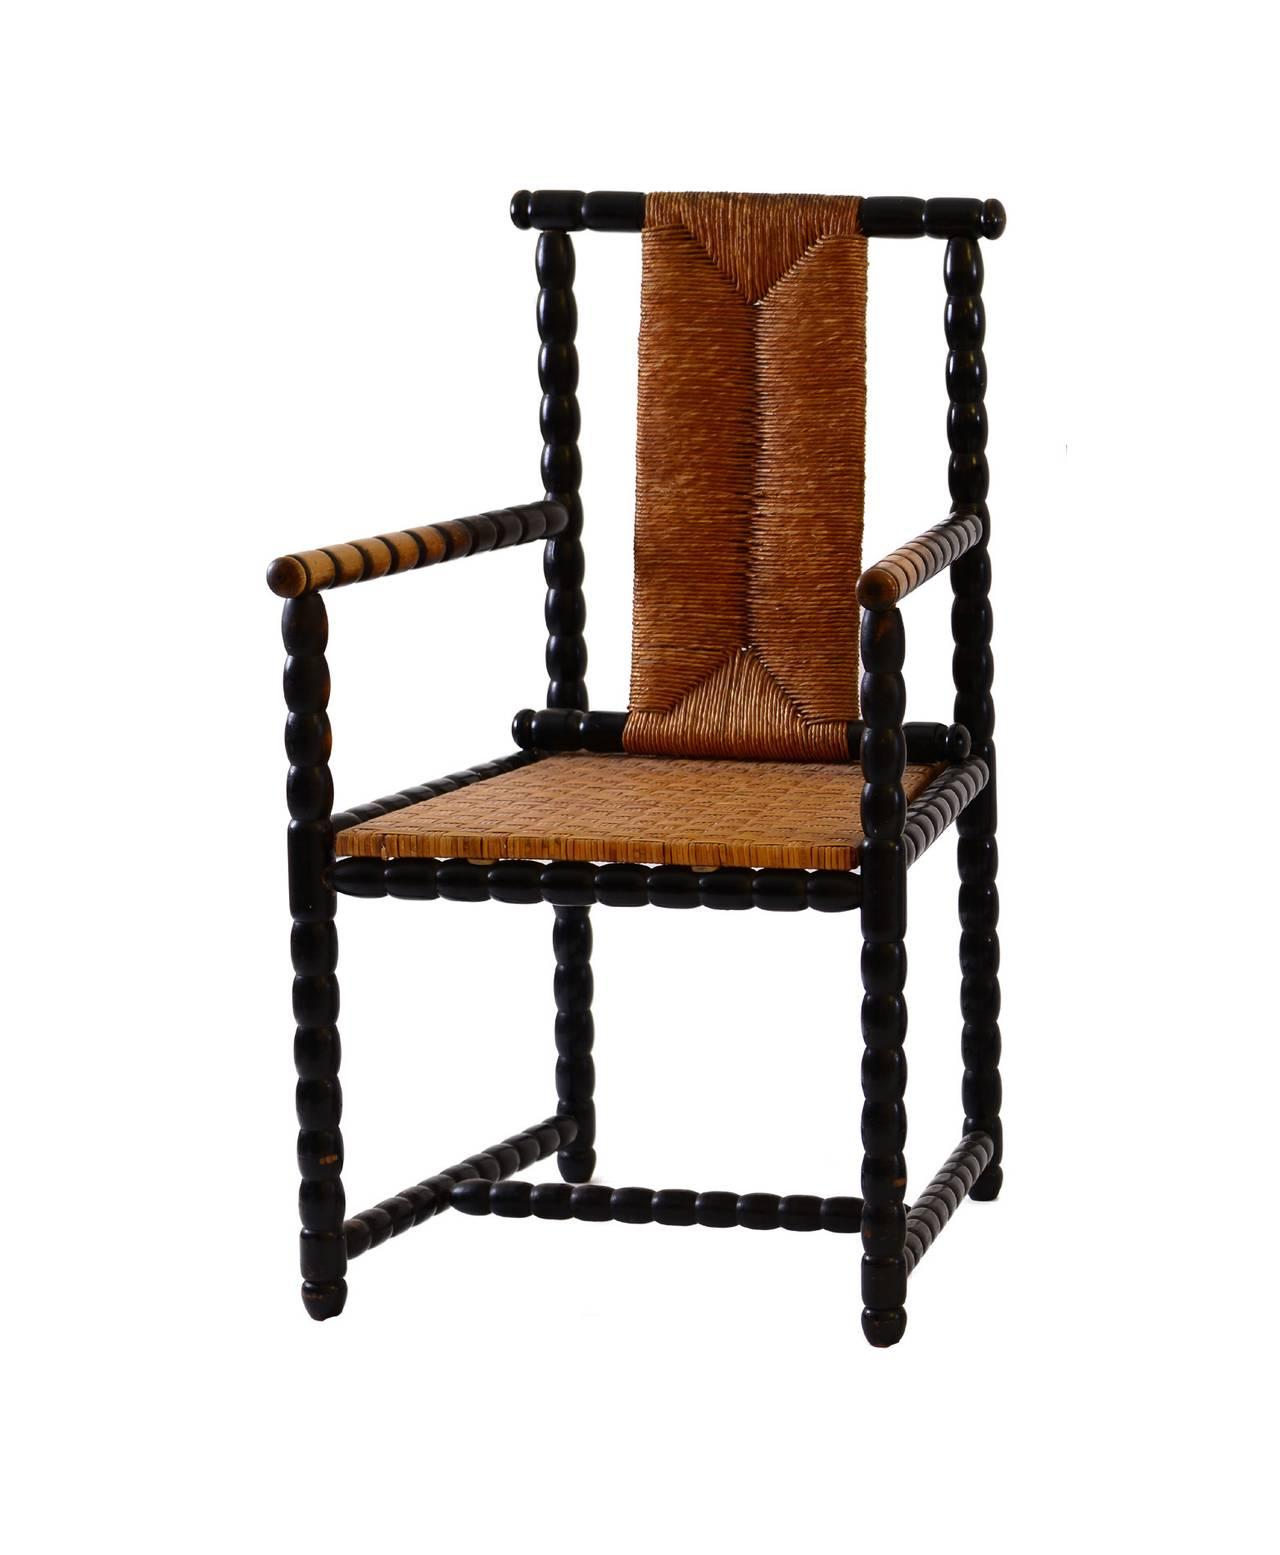 Living Room Suites For Sale: Josef Zotti Sitting Room Suite, 1911 For Sale At 1stdibs